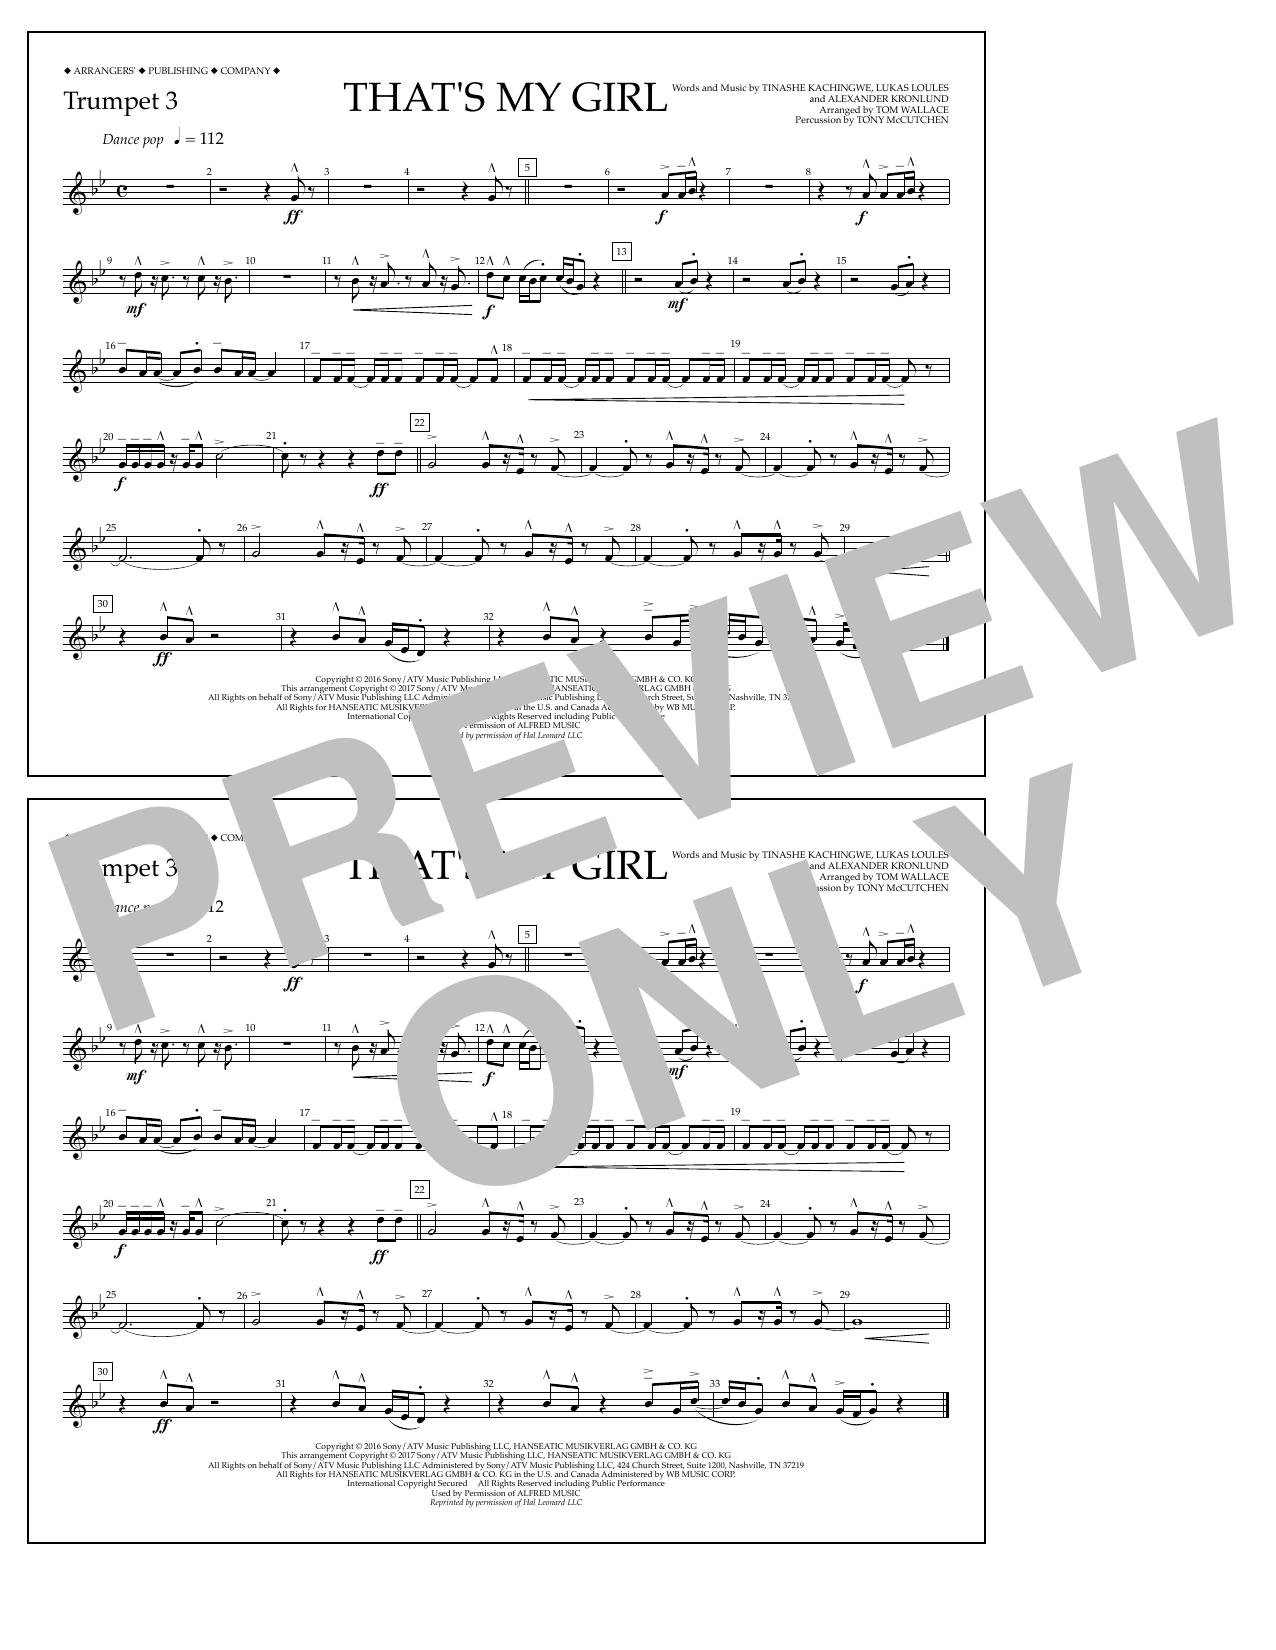 That's My Girl - Trumpet 3 Sheet Music